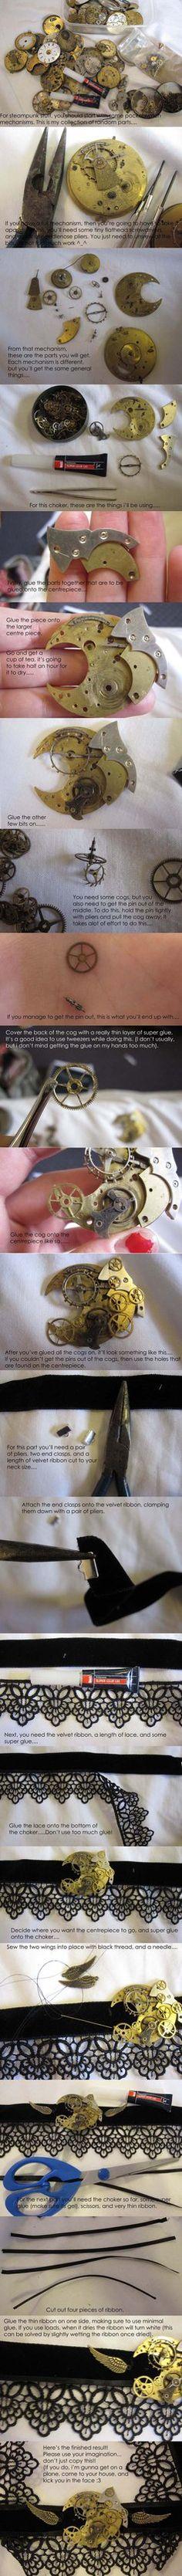 Steampunk jewellery tutorial by ~Gothic-Enchantress on deviantART